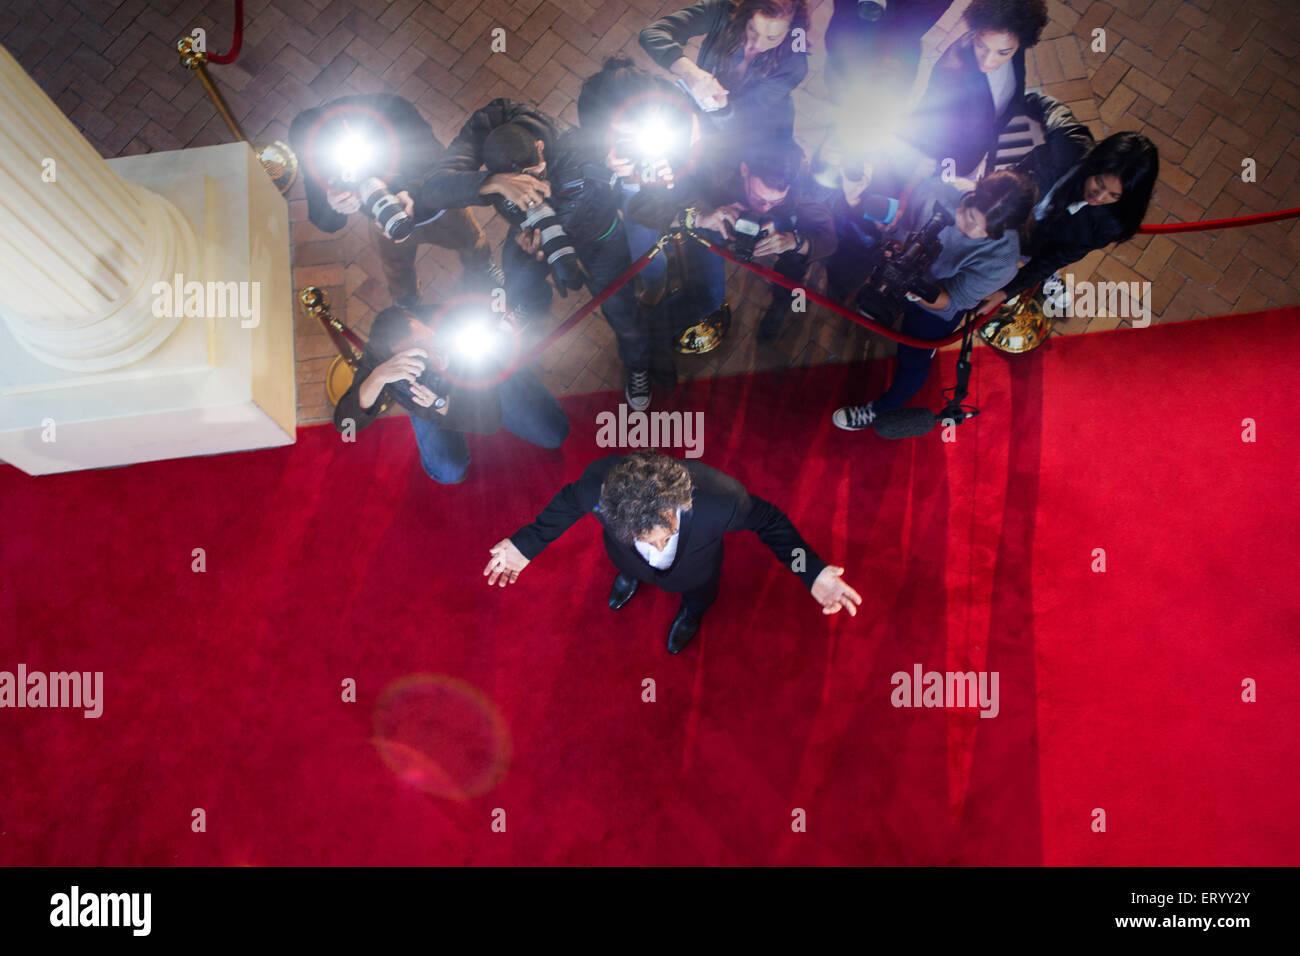 Fotógrafos Paparazzi fotografiando celebridad al evento de alfombra roja Foto de stock